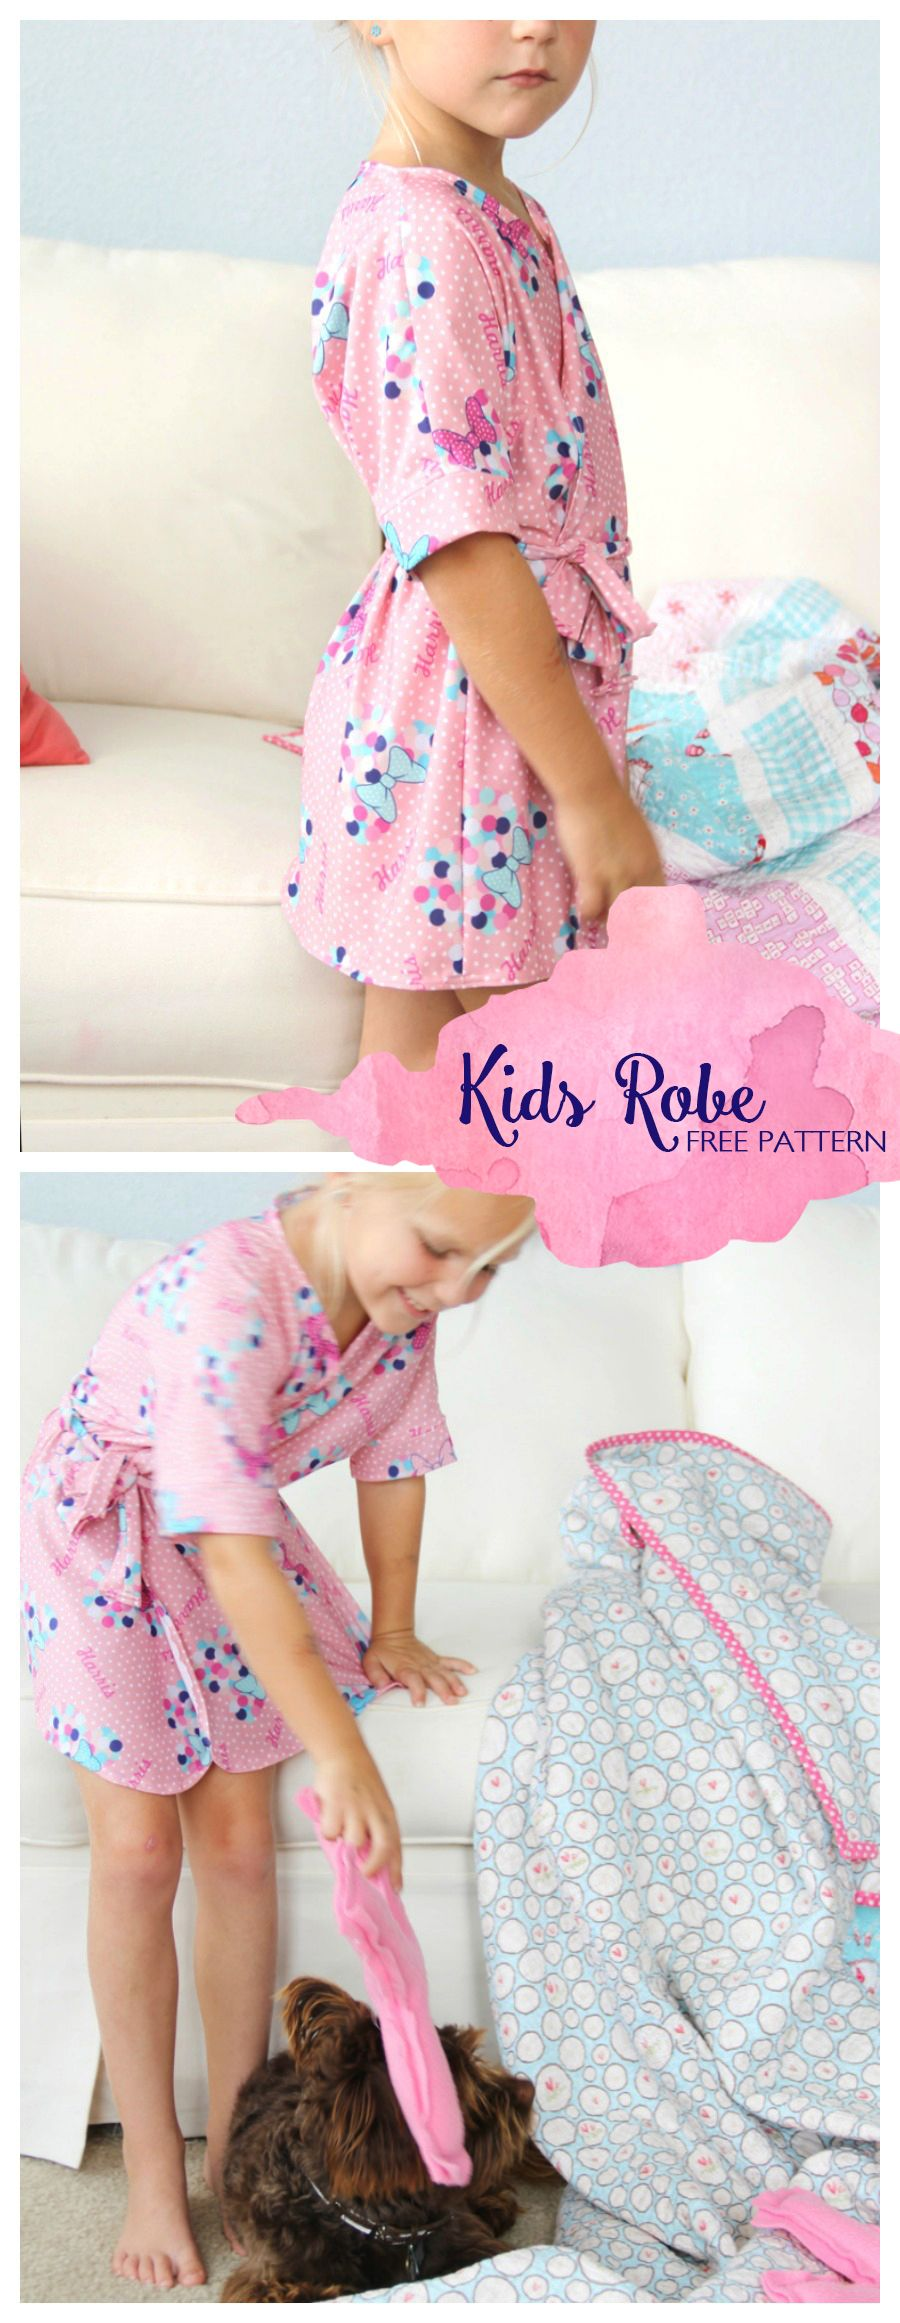 Kids bathrobe sewing patterns robe and easy how to sew an easy kids bathrobe with free robe sewing pattern jeuxipadfo Gallery